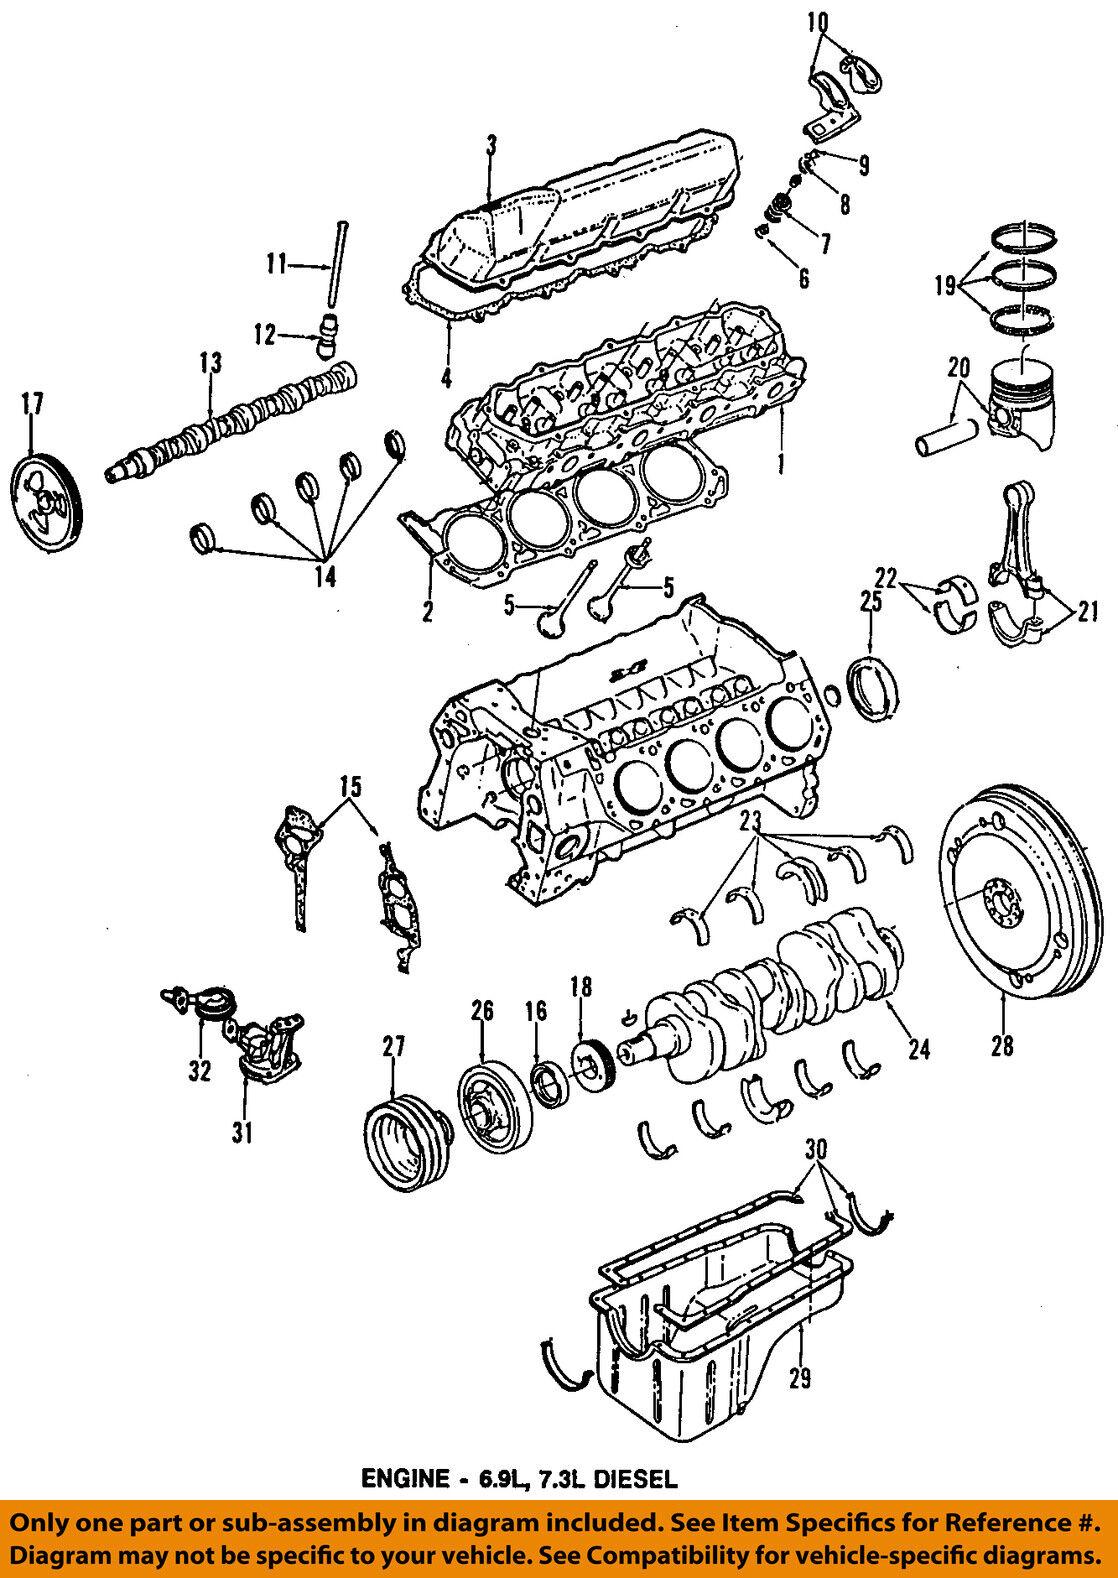 Ford Oem Crankshaft Sprocket Nos E3tz 6306 A 73l 1983 1991 F250 7 3l Powerstroke Engine Diagram Norton Secured Powered By Verisign